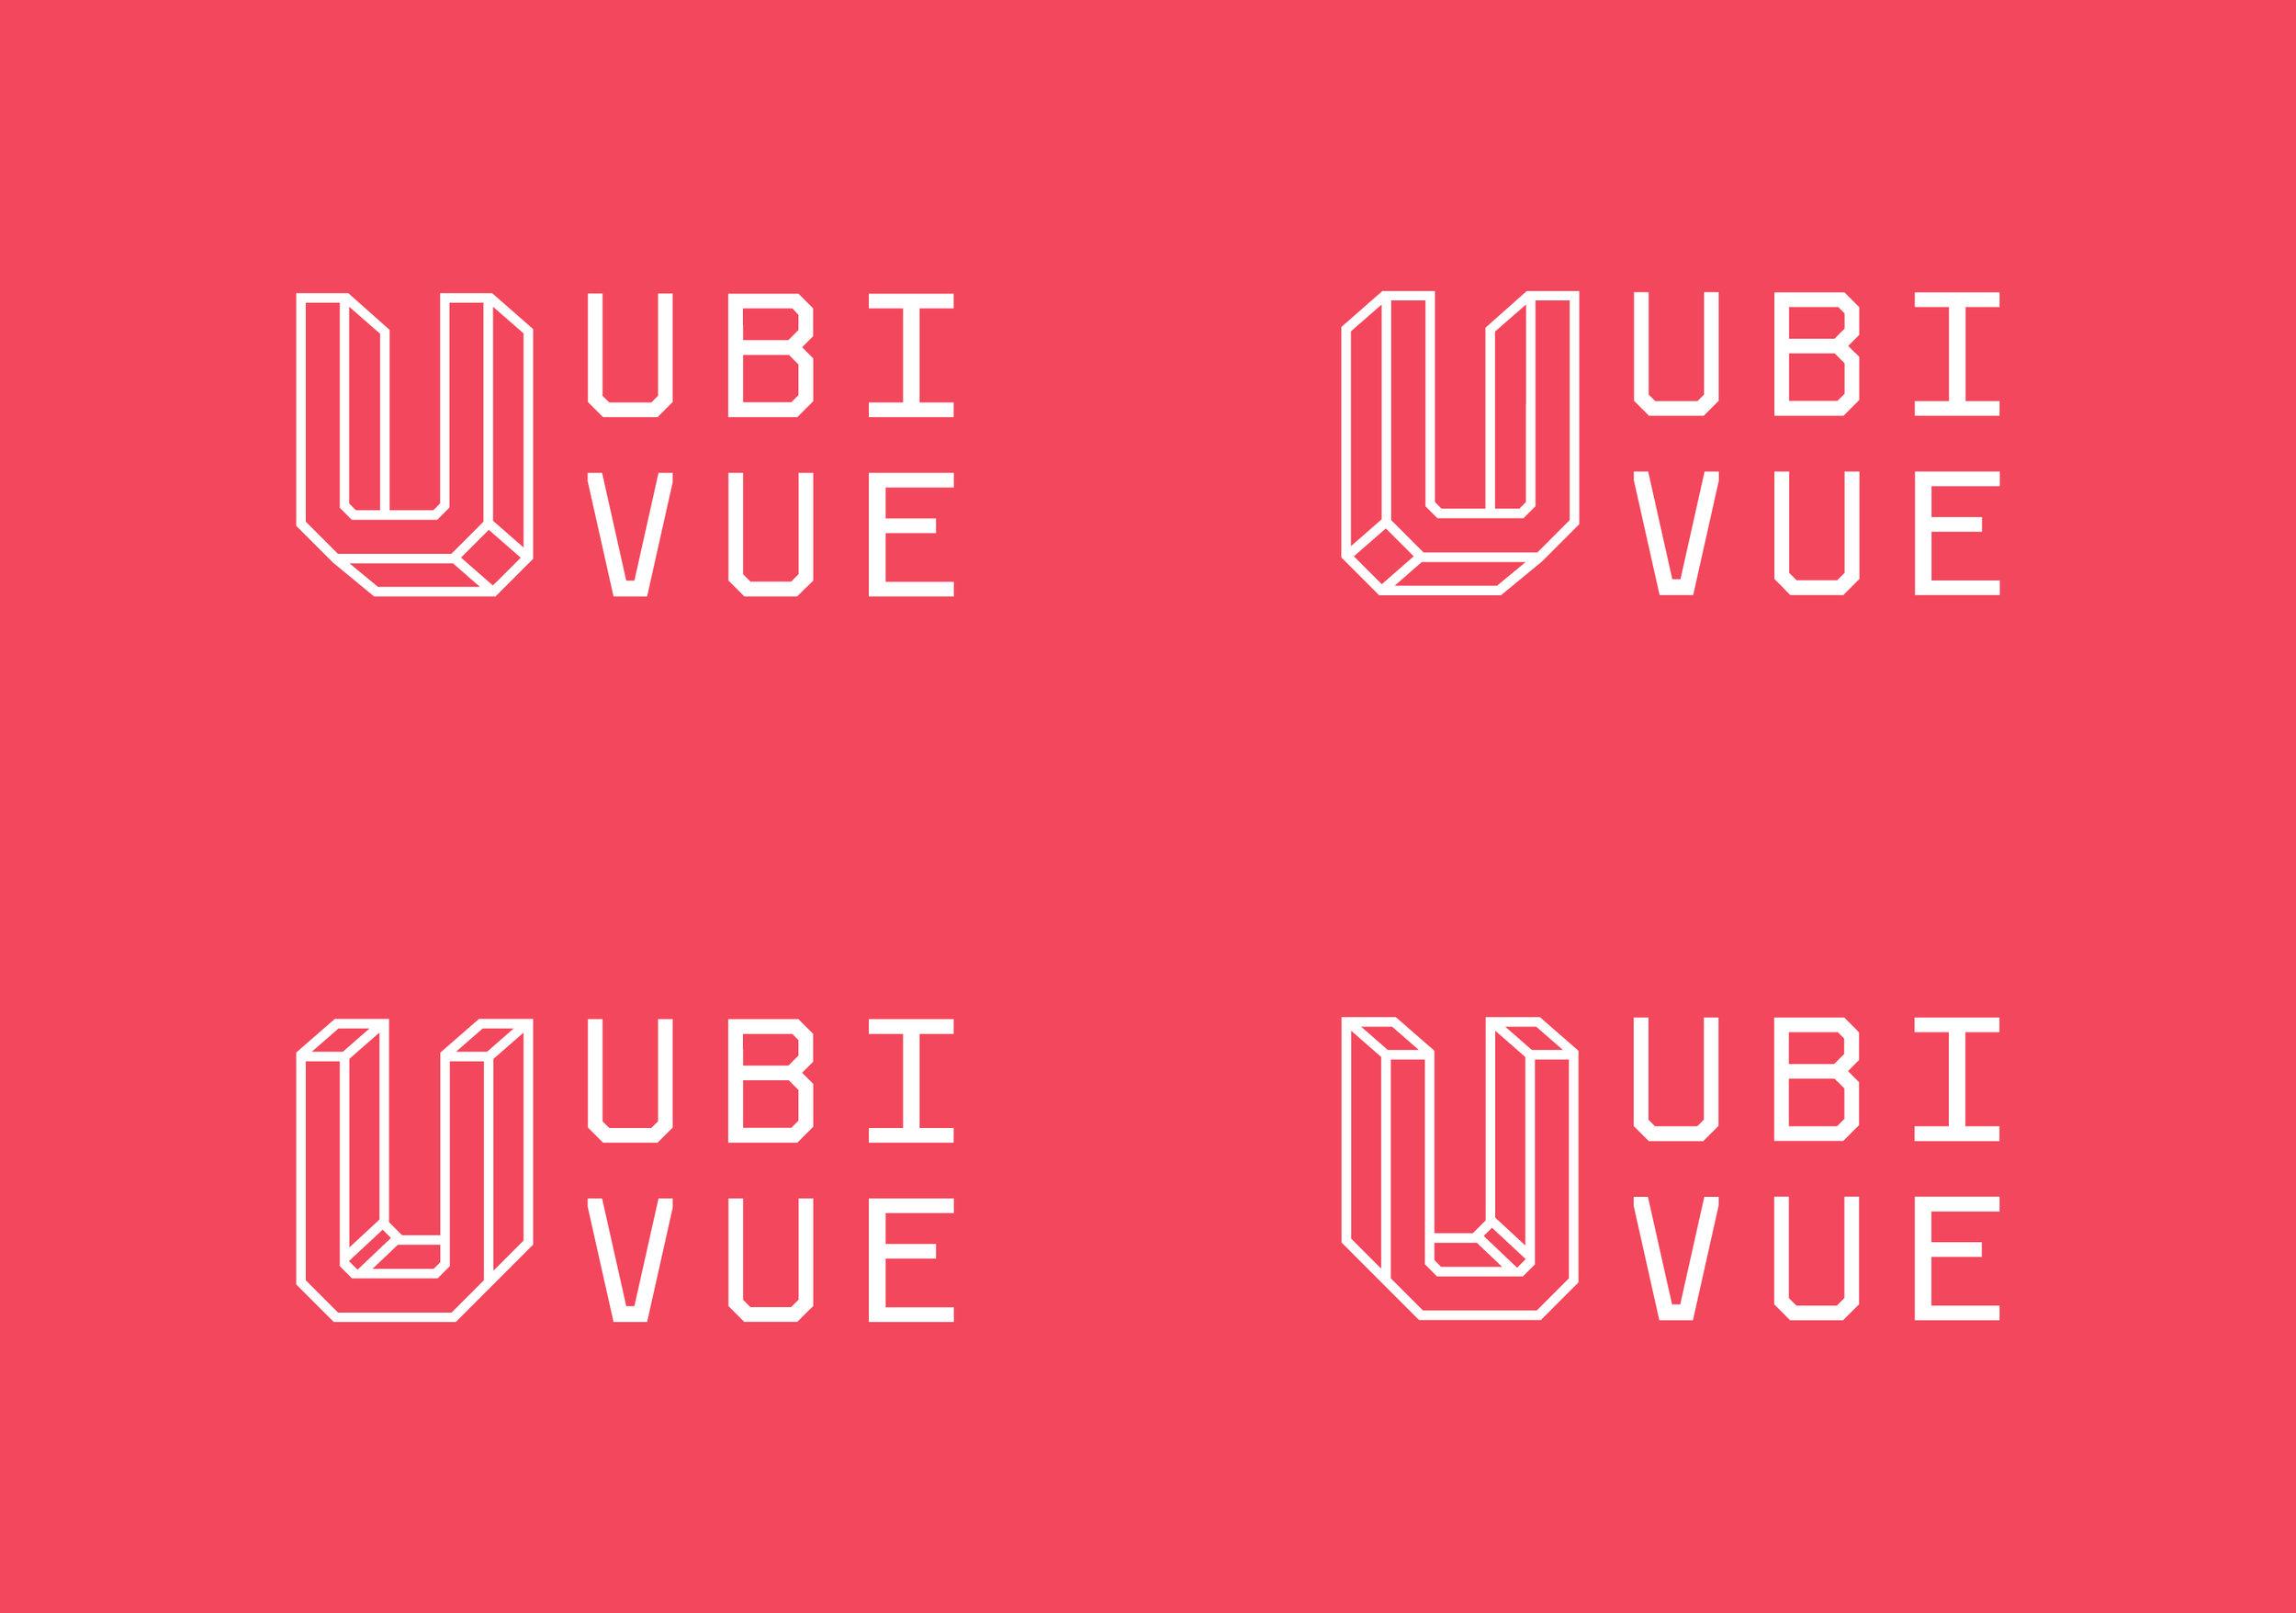 Studio Freight - Ubivue Logos Banner